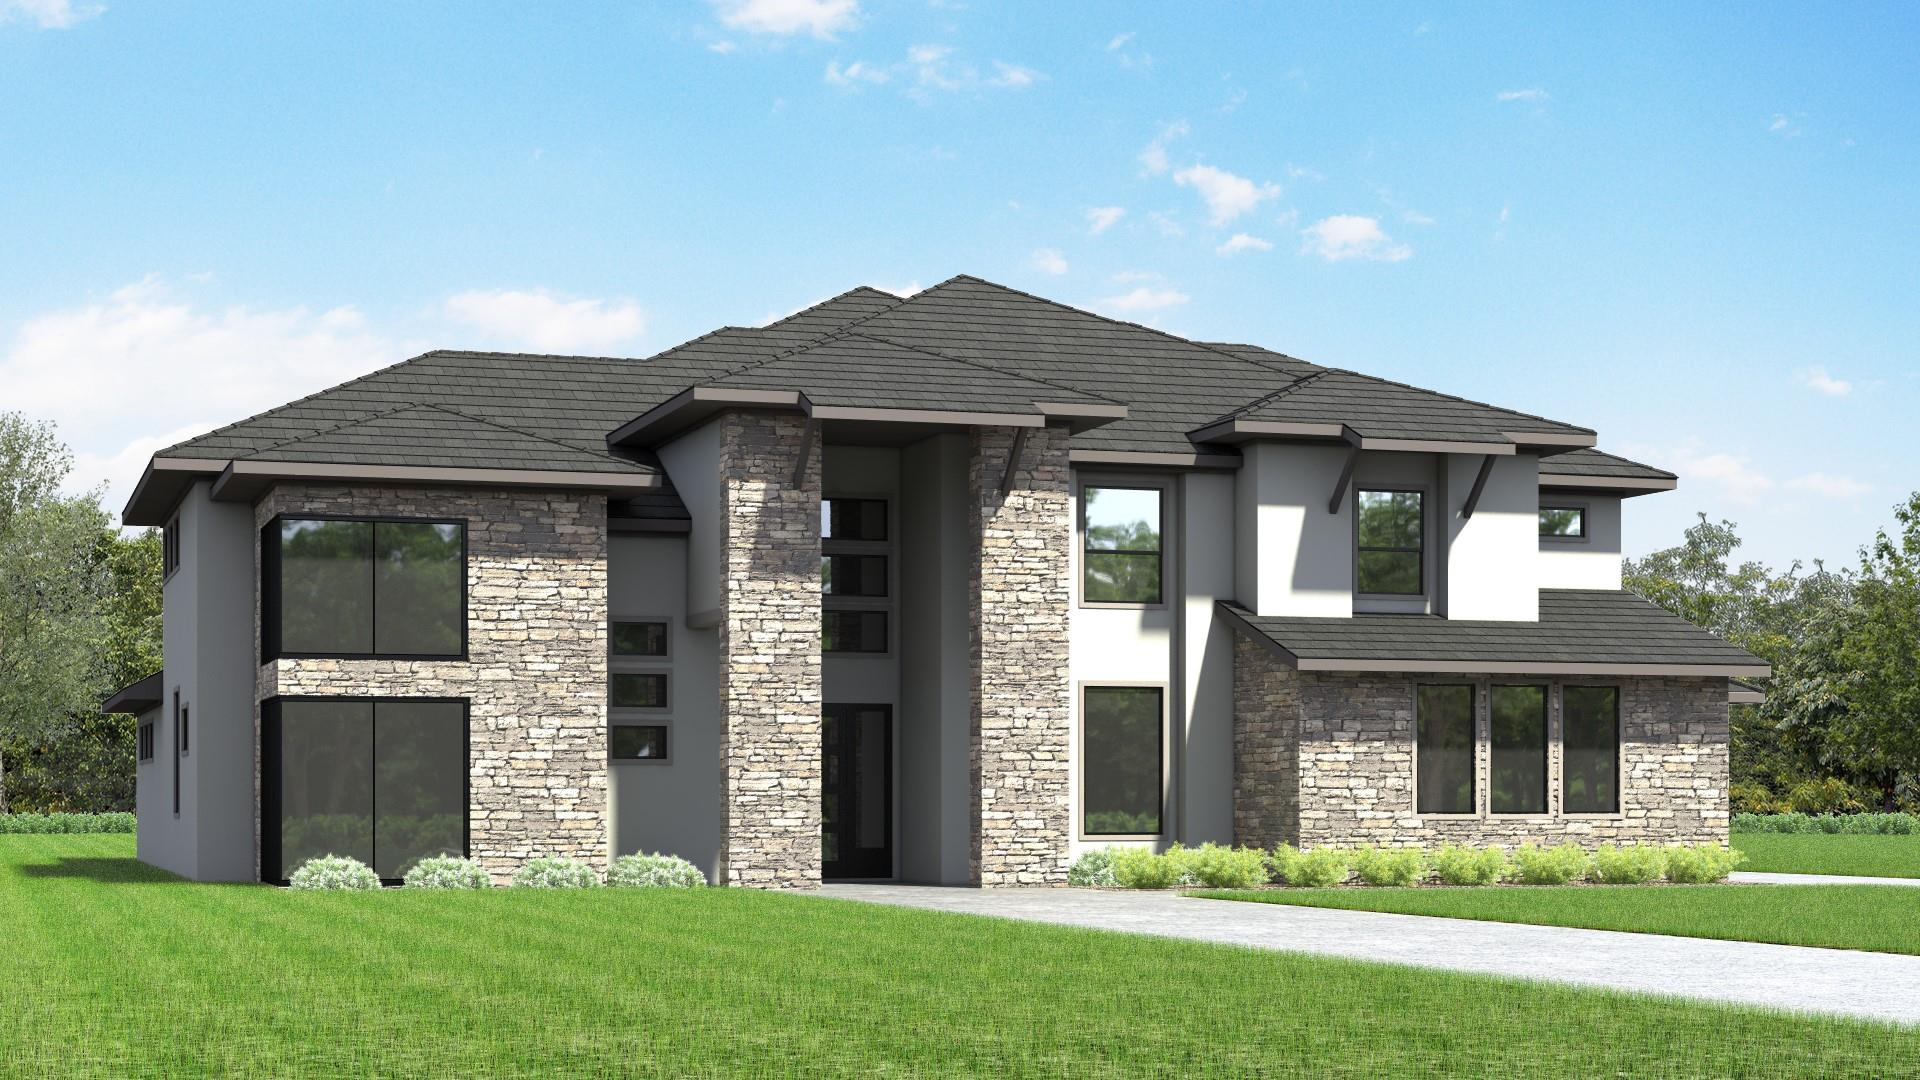 19310 Round Prairie Property Photo - Cypress, TX real estate listing